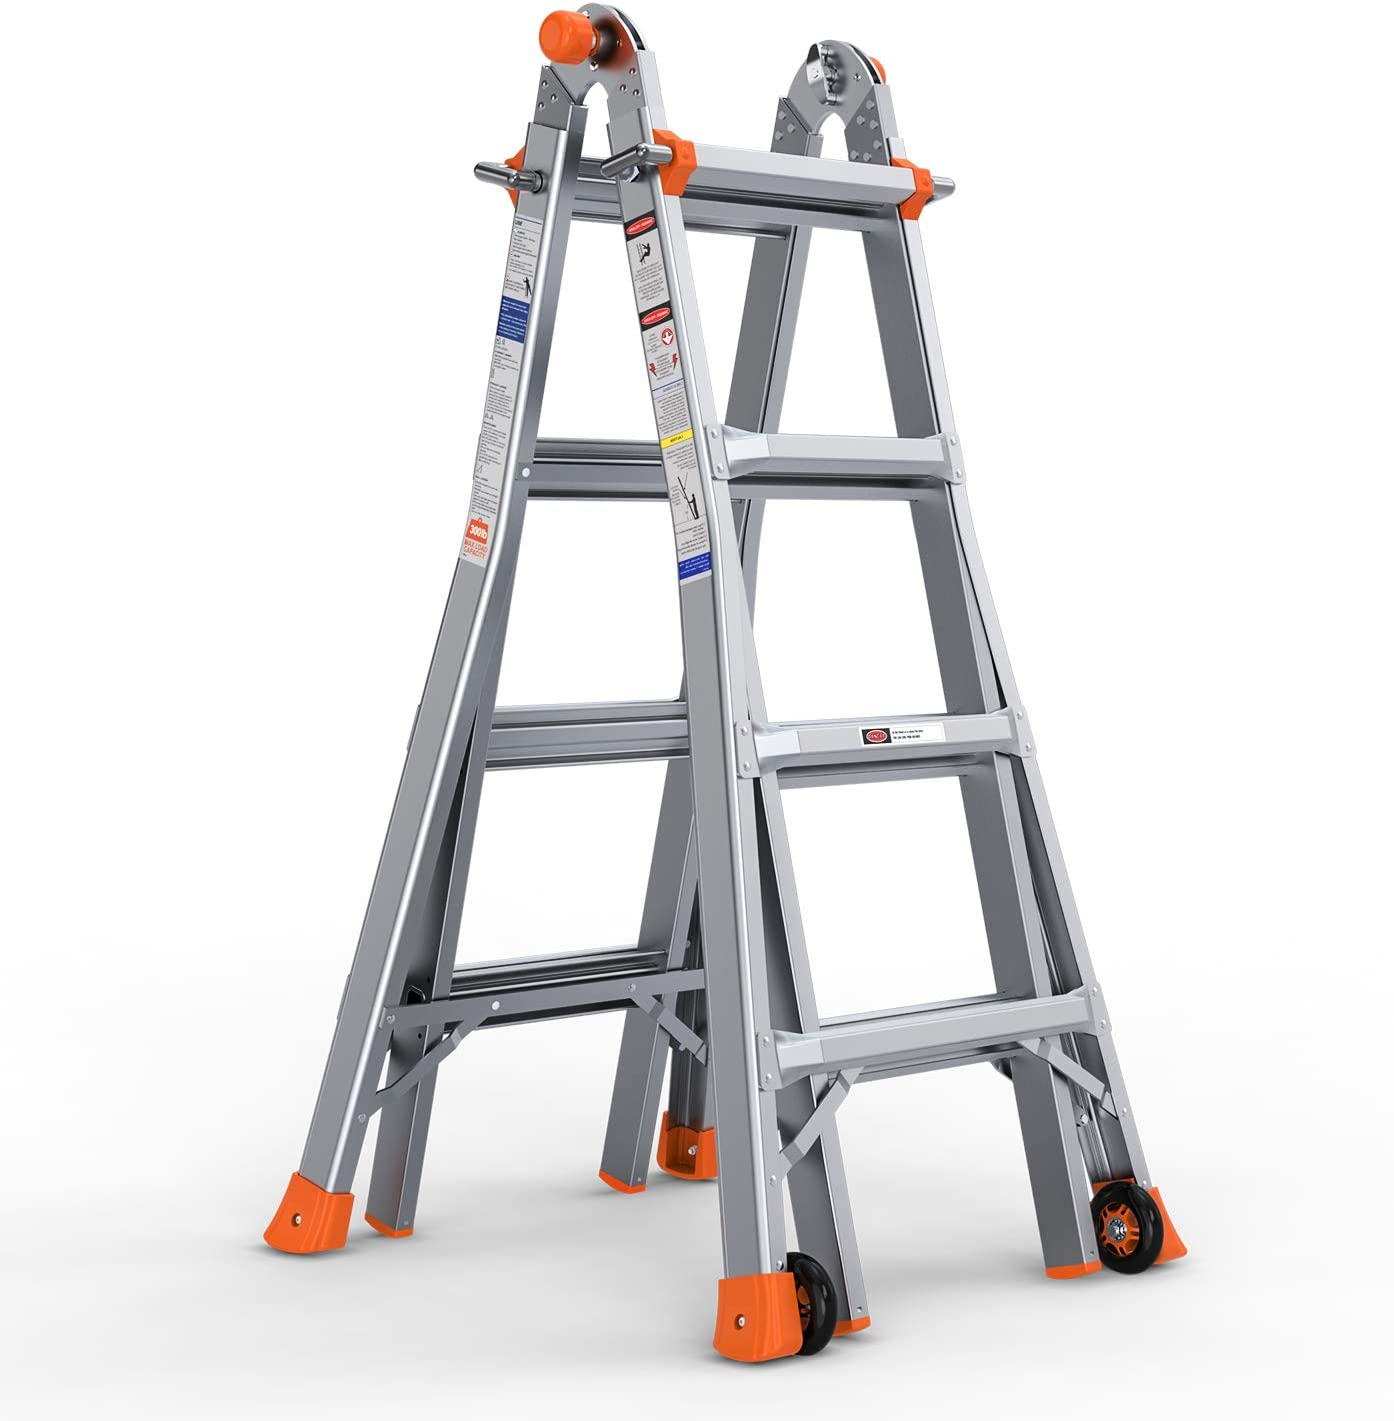 OT QOMOTOP 17 FT Telescoping Multi Position Ladder with Wheels